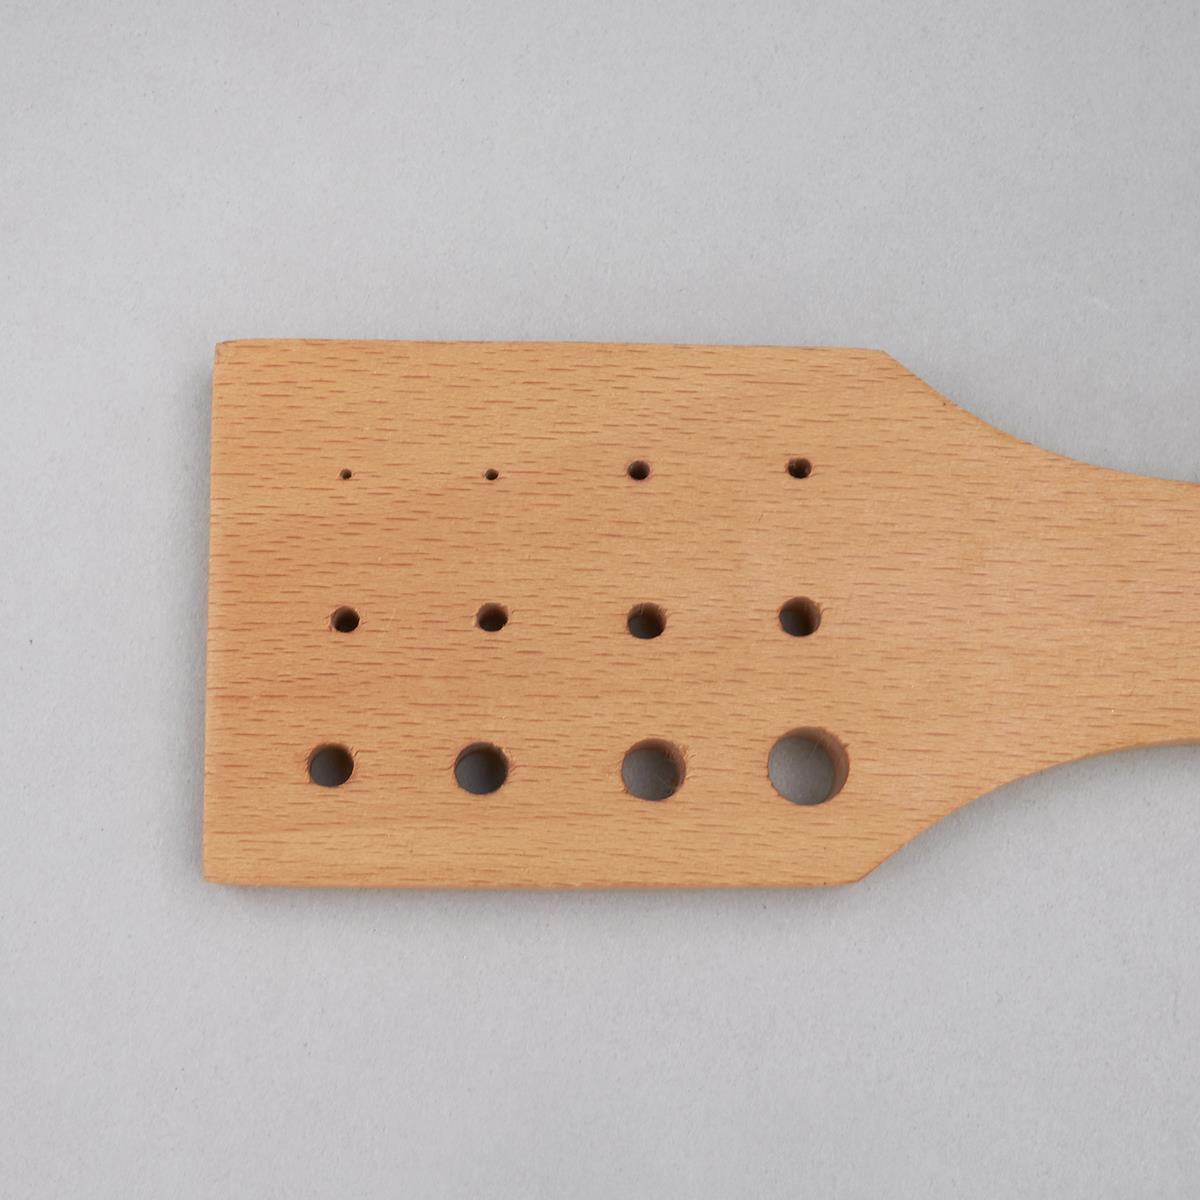 Wooden Draw Plate & Wooden Draw Plate | JewelleryMaker.com